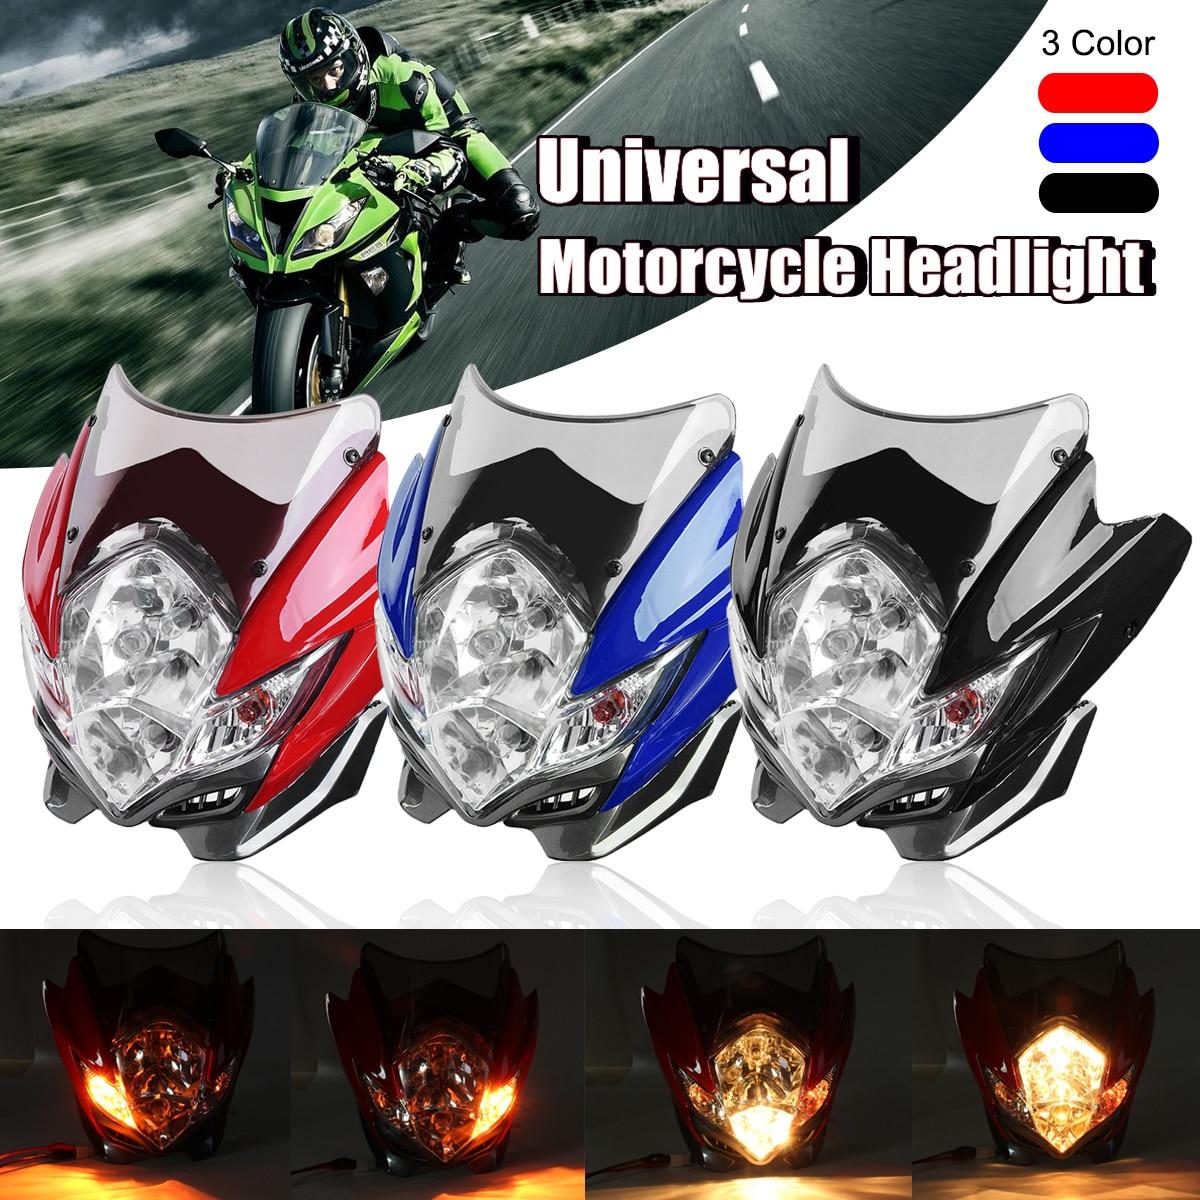 Mofaner Universal Motorcycle Street Fighter Headlight Lamp Bike FairingMofaner Universal Motorcycle Street Fighter Headlight Lamp Bike Fairing